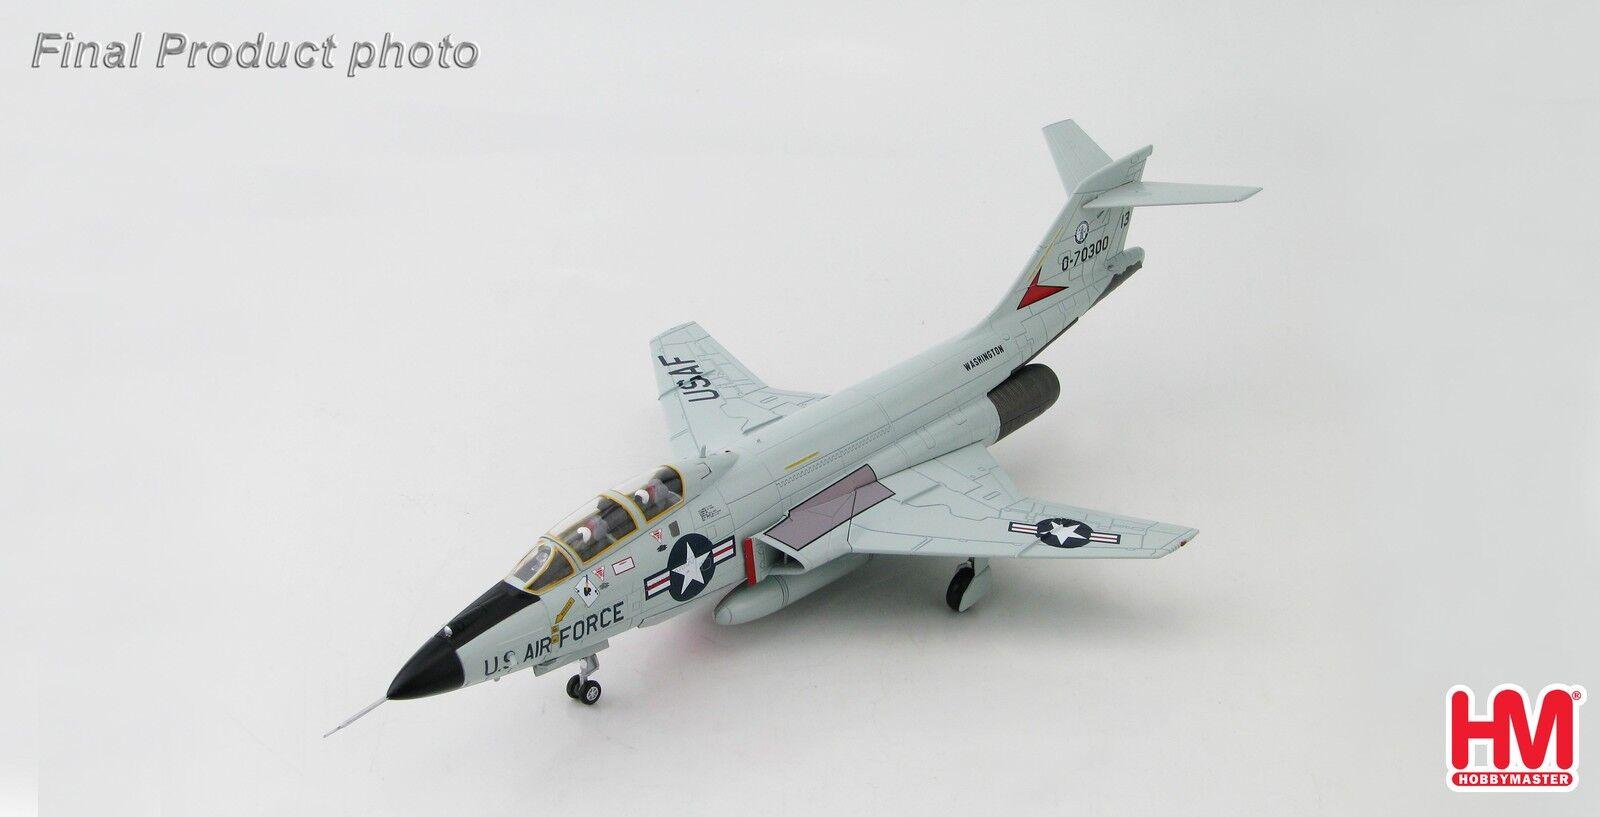 Mc DONNELL F-101B VOODOO, 1975 - HOBBY MASTER 1/72 - Réf. HA3711